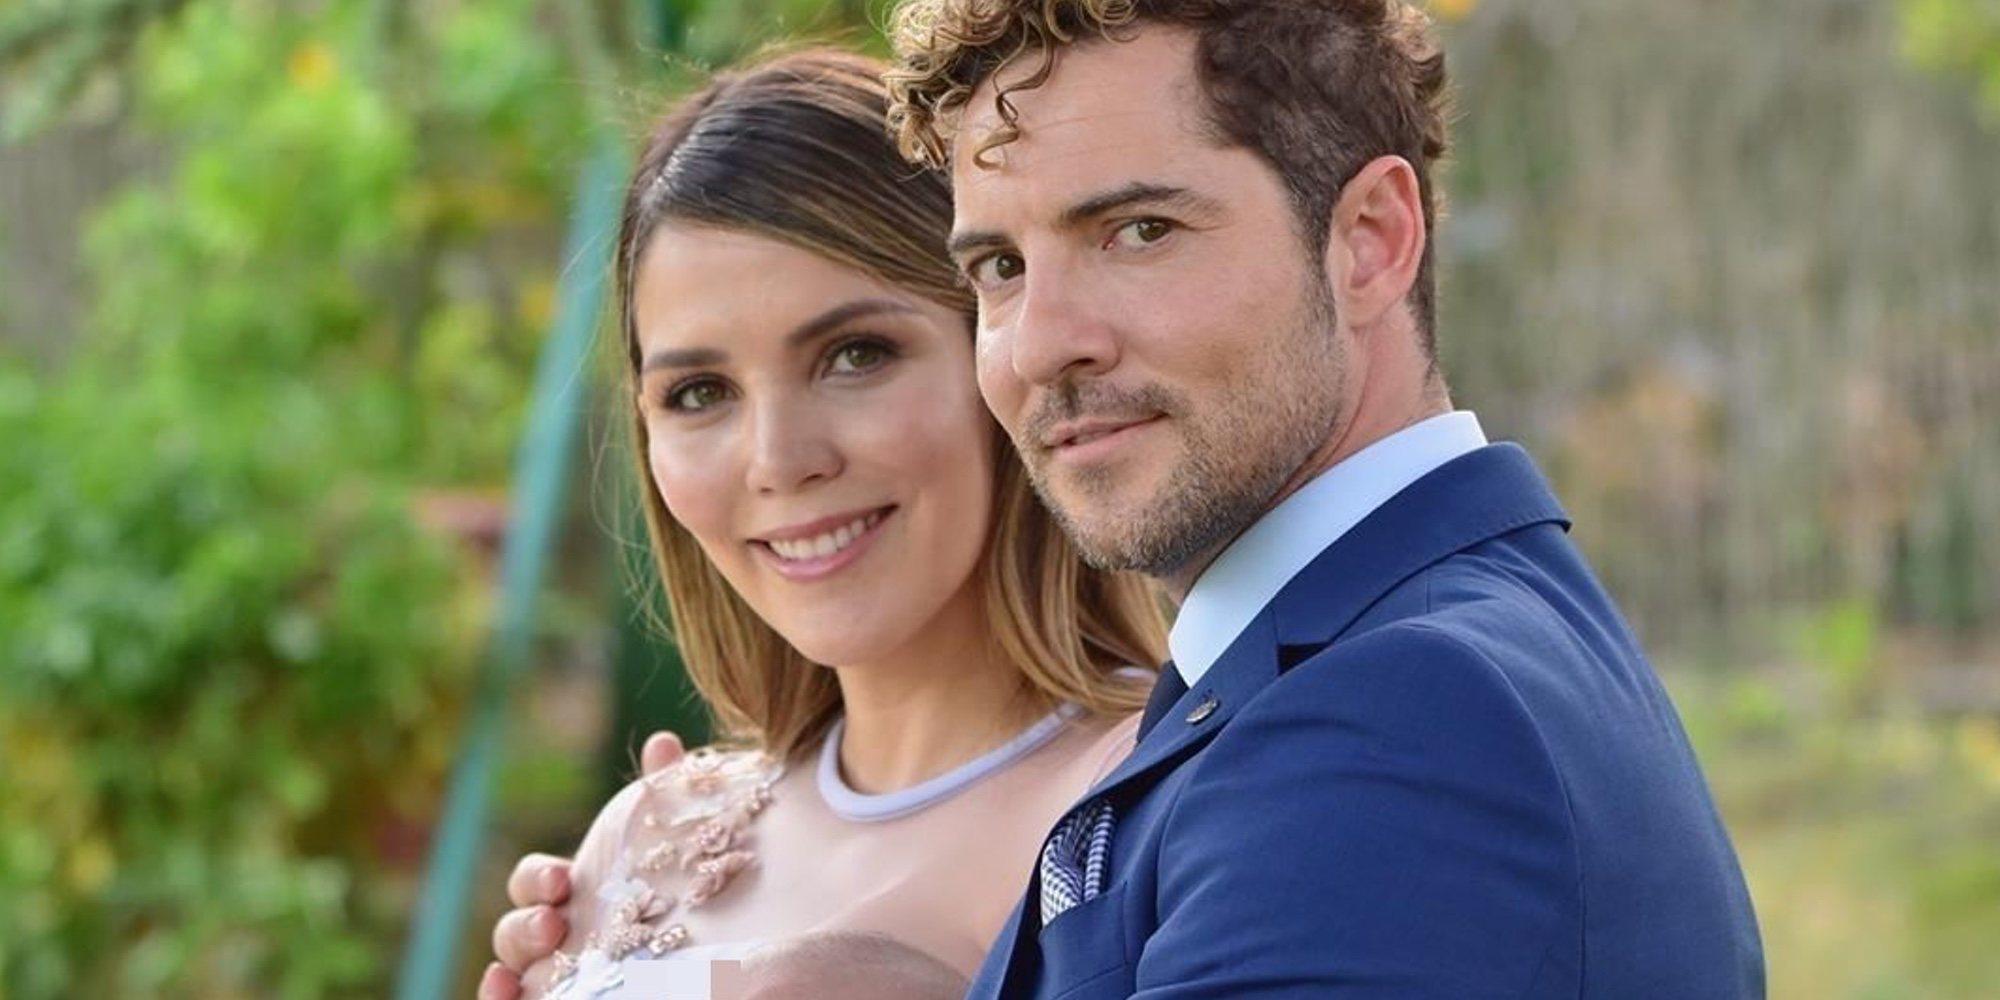 David Bisbal y Rosanna Zanetti han sido padres de una niña